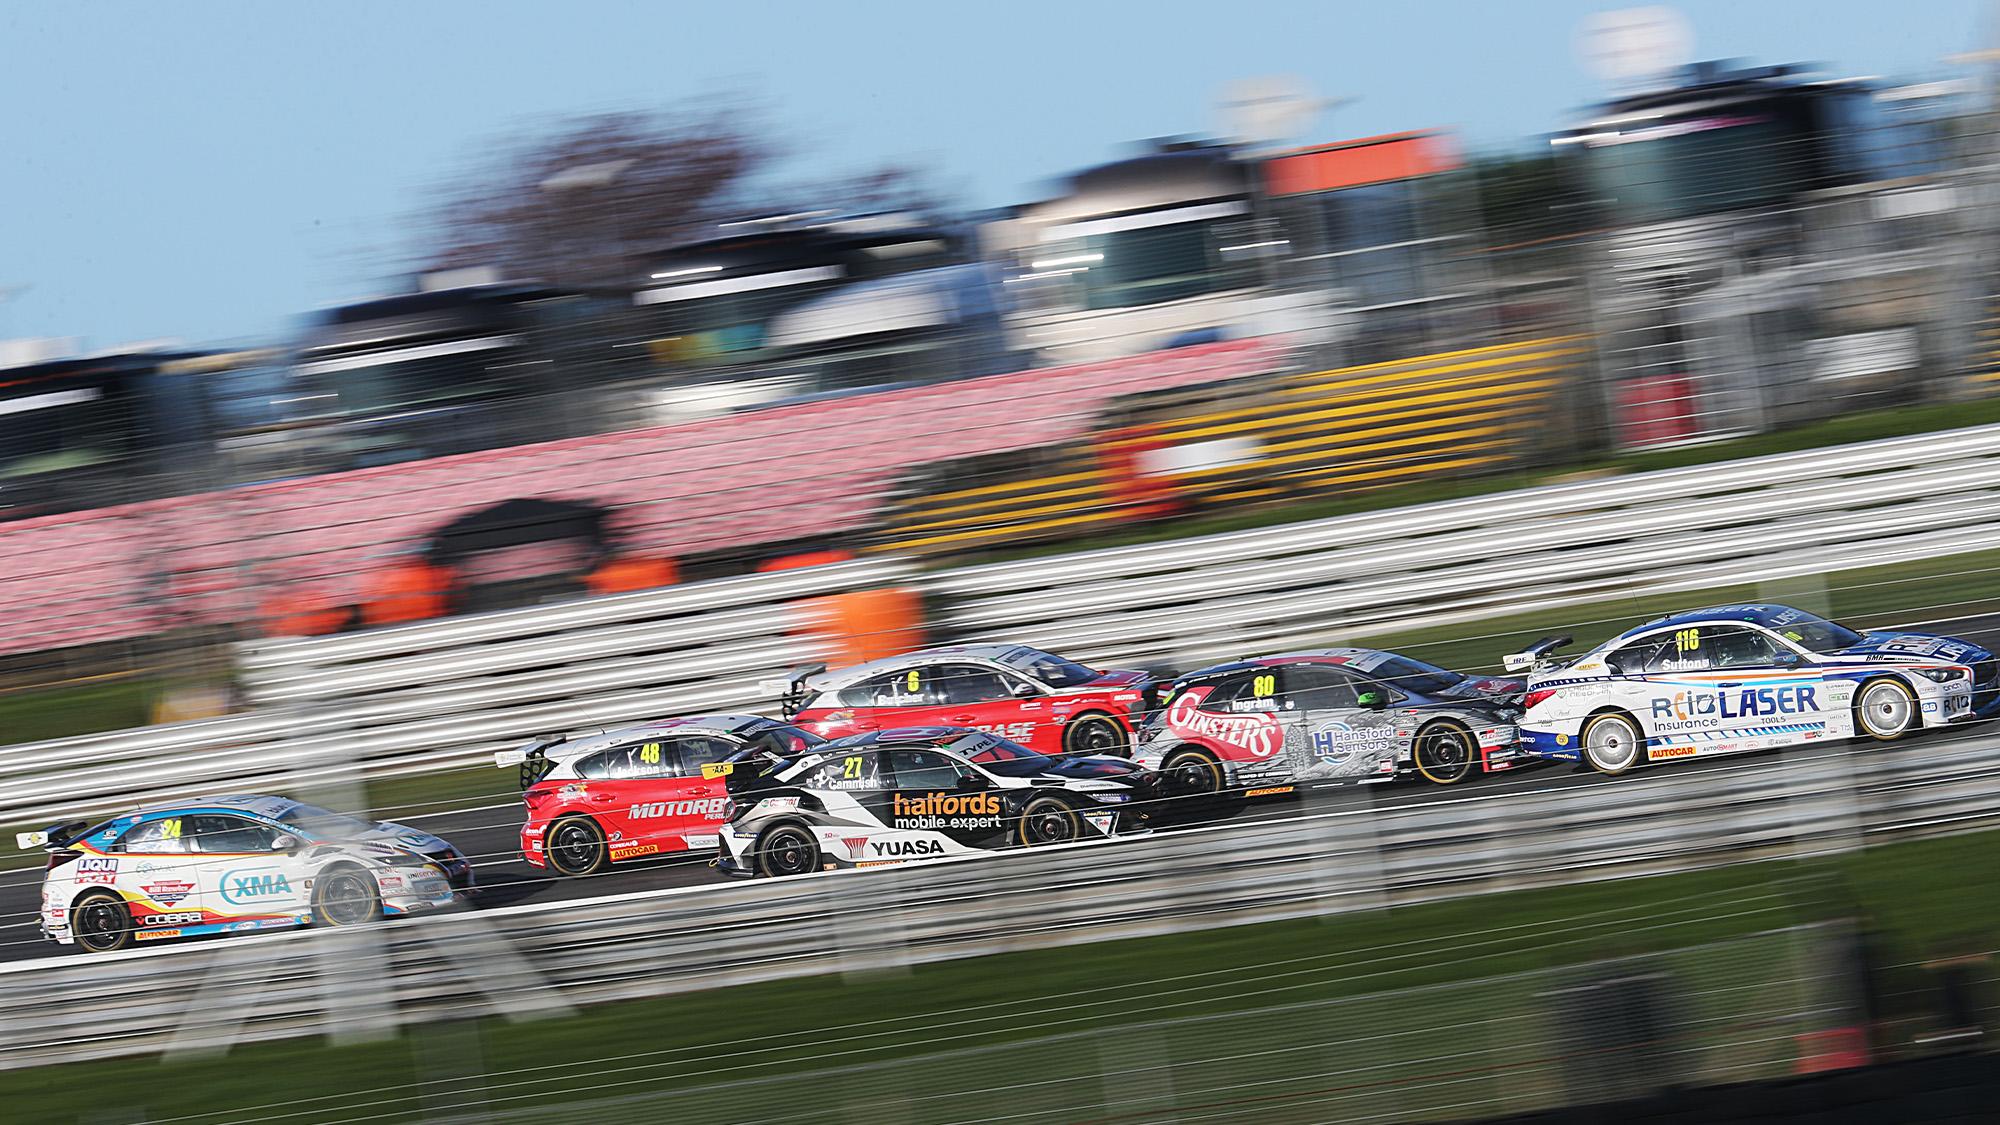 Start of Race 2 at the 2020 Brands Hatch Indy BTCC round